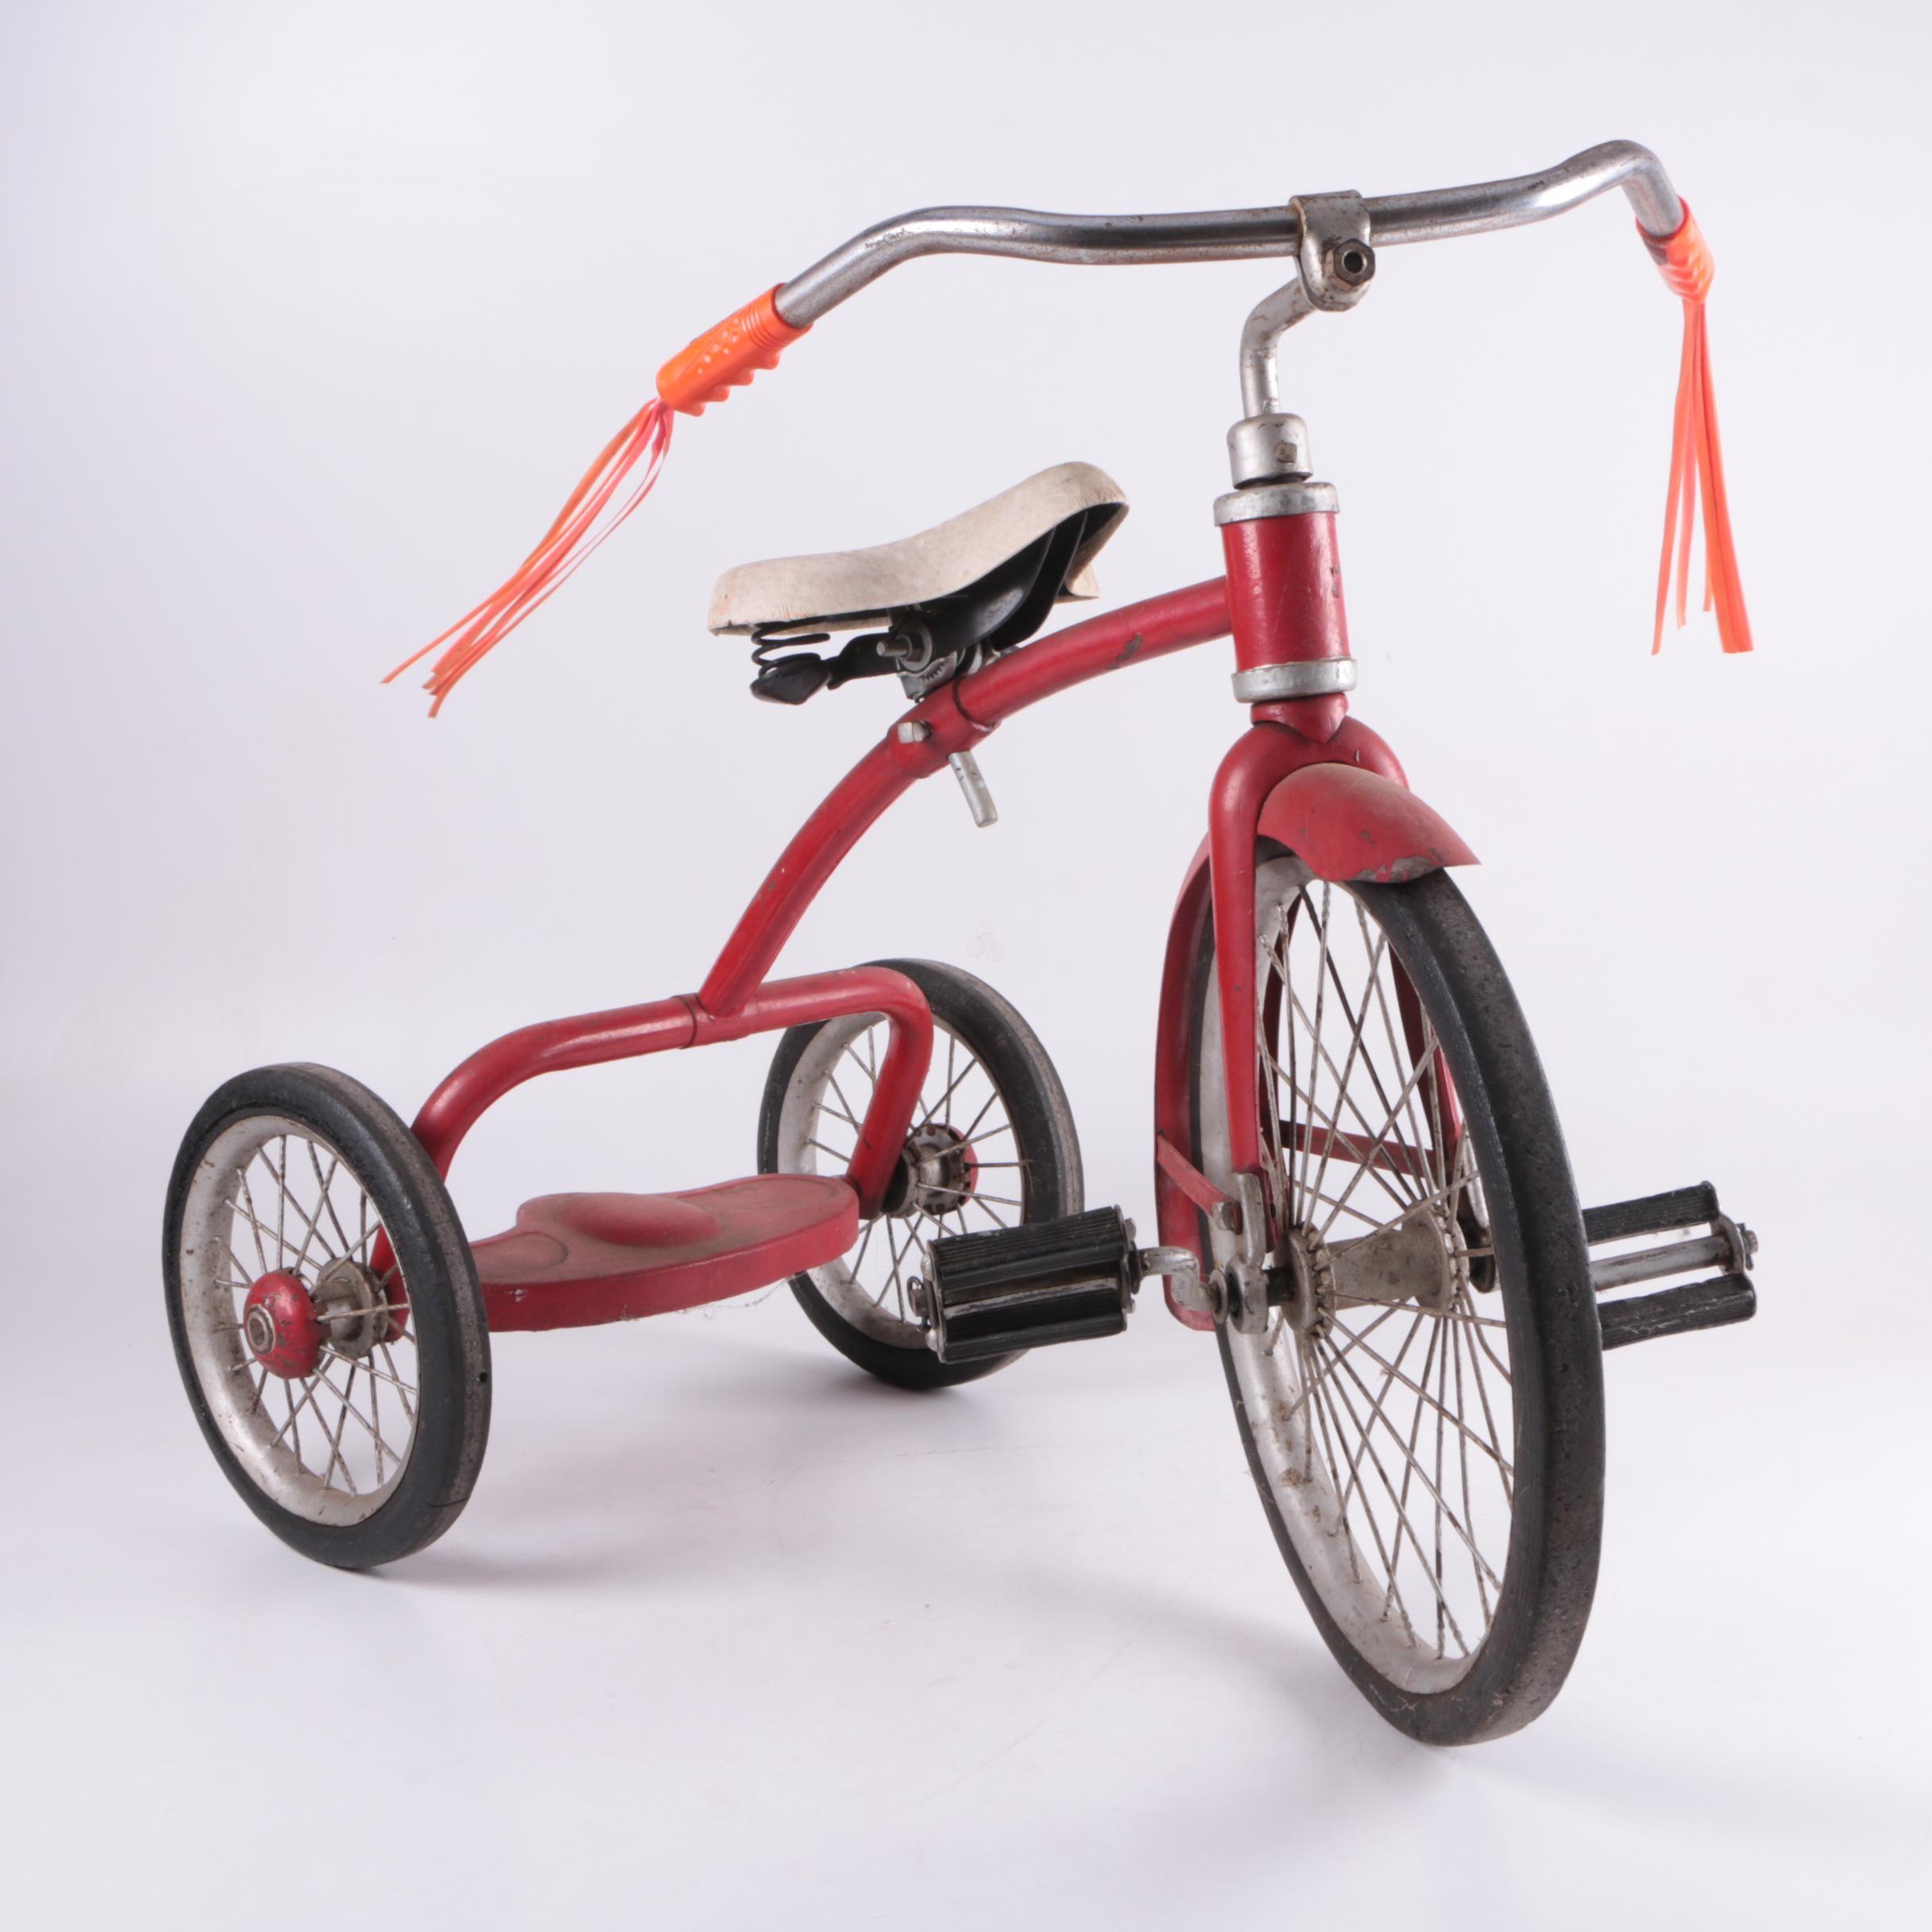 Vintage Children's Tricycle